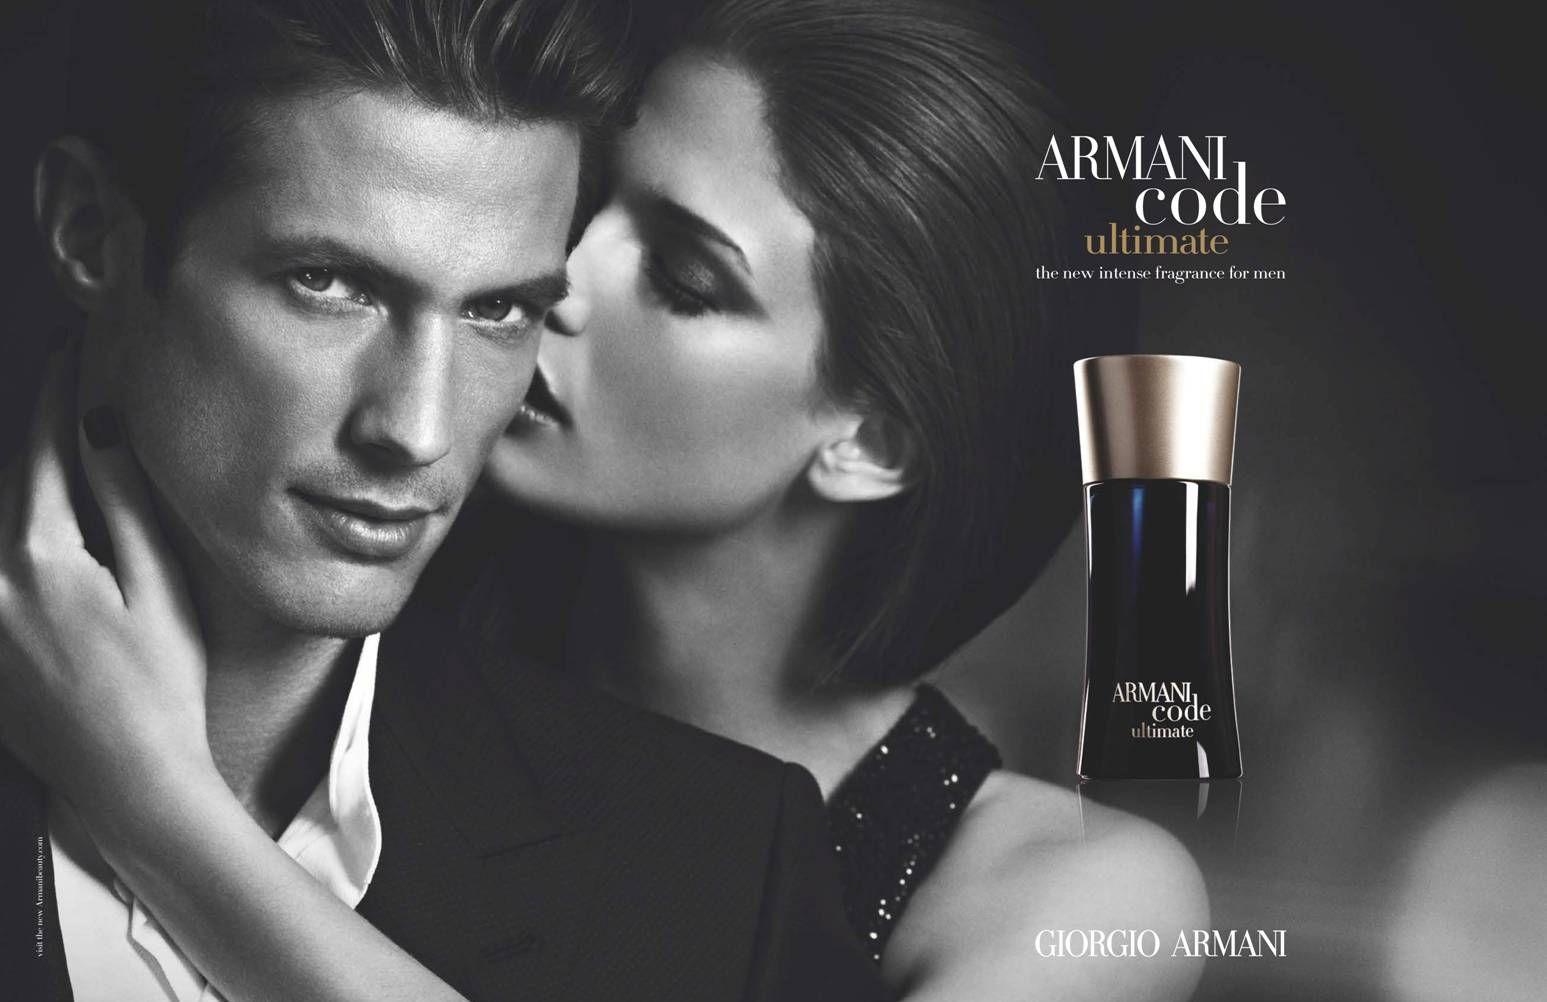 Domenique Melchior for Armani Code Ultimate | Anuncio perfume, Perfume,  Perfumes hombre